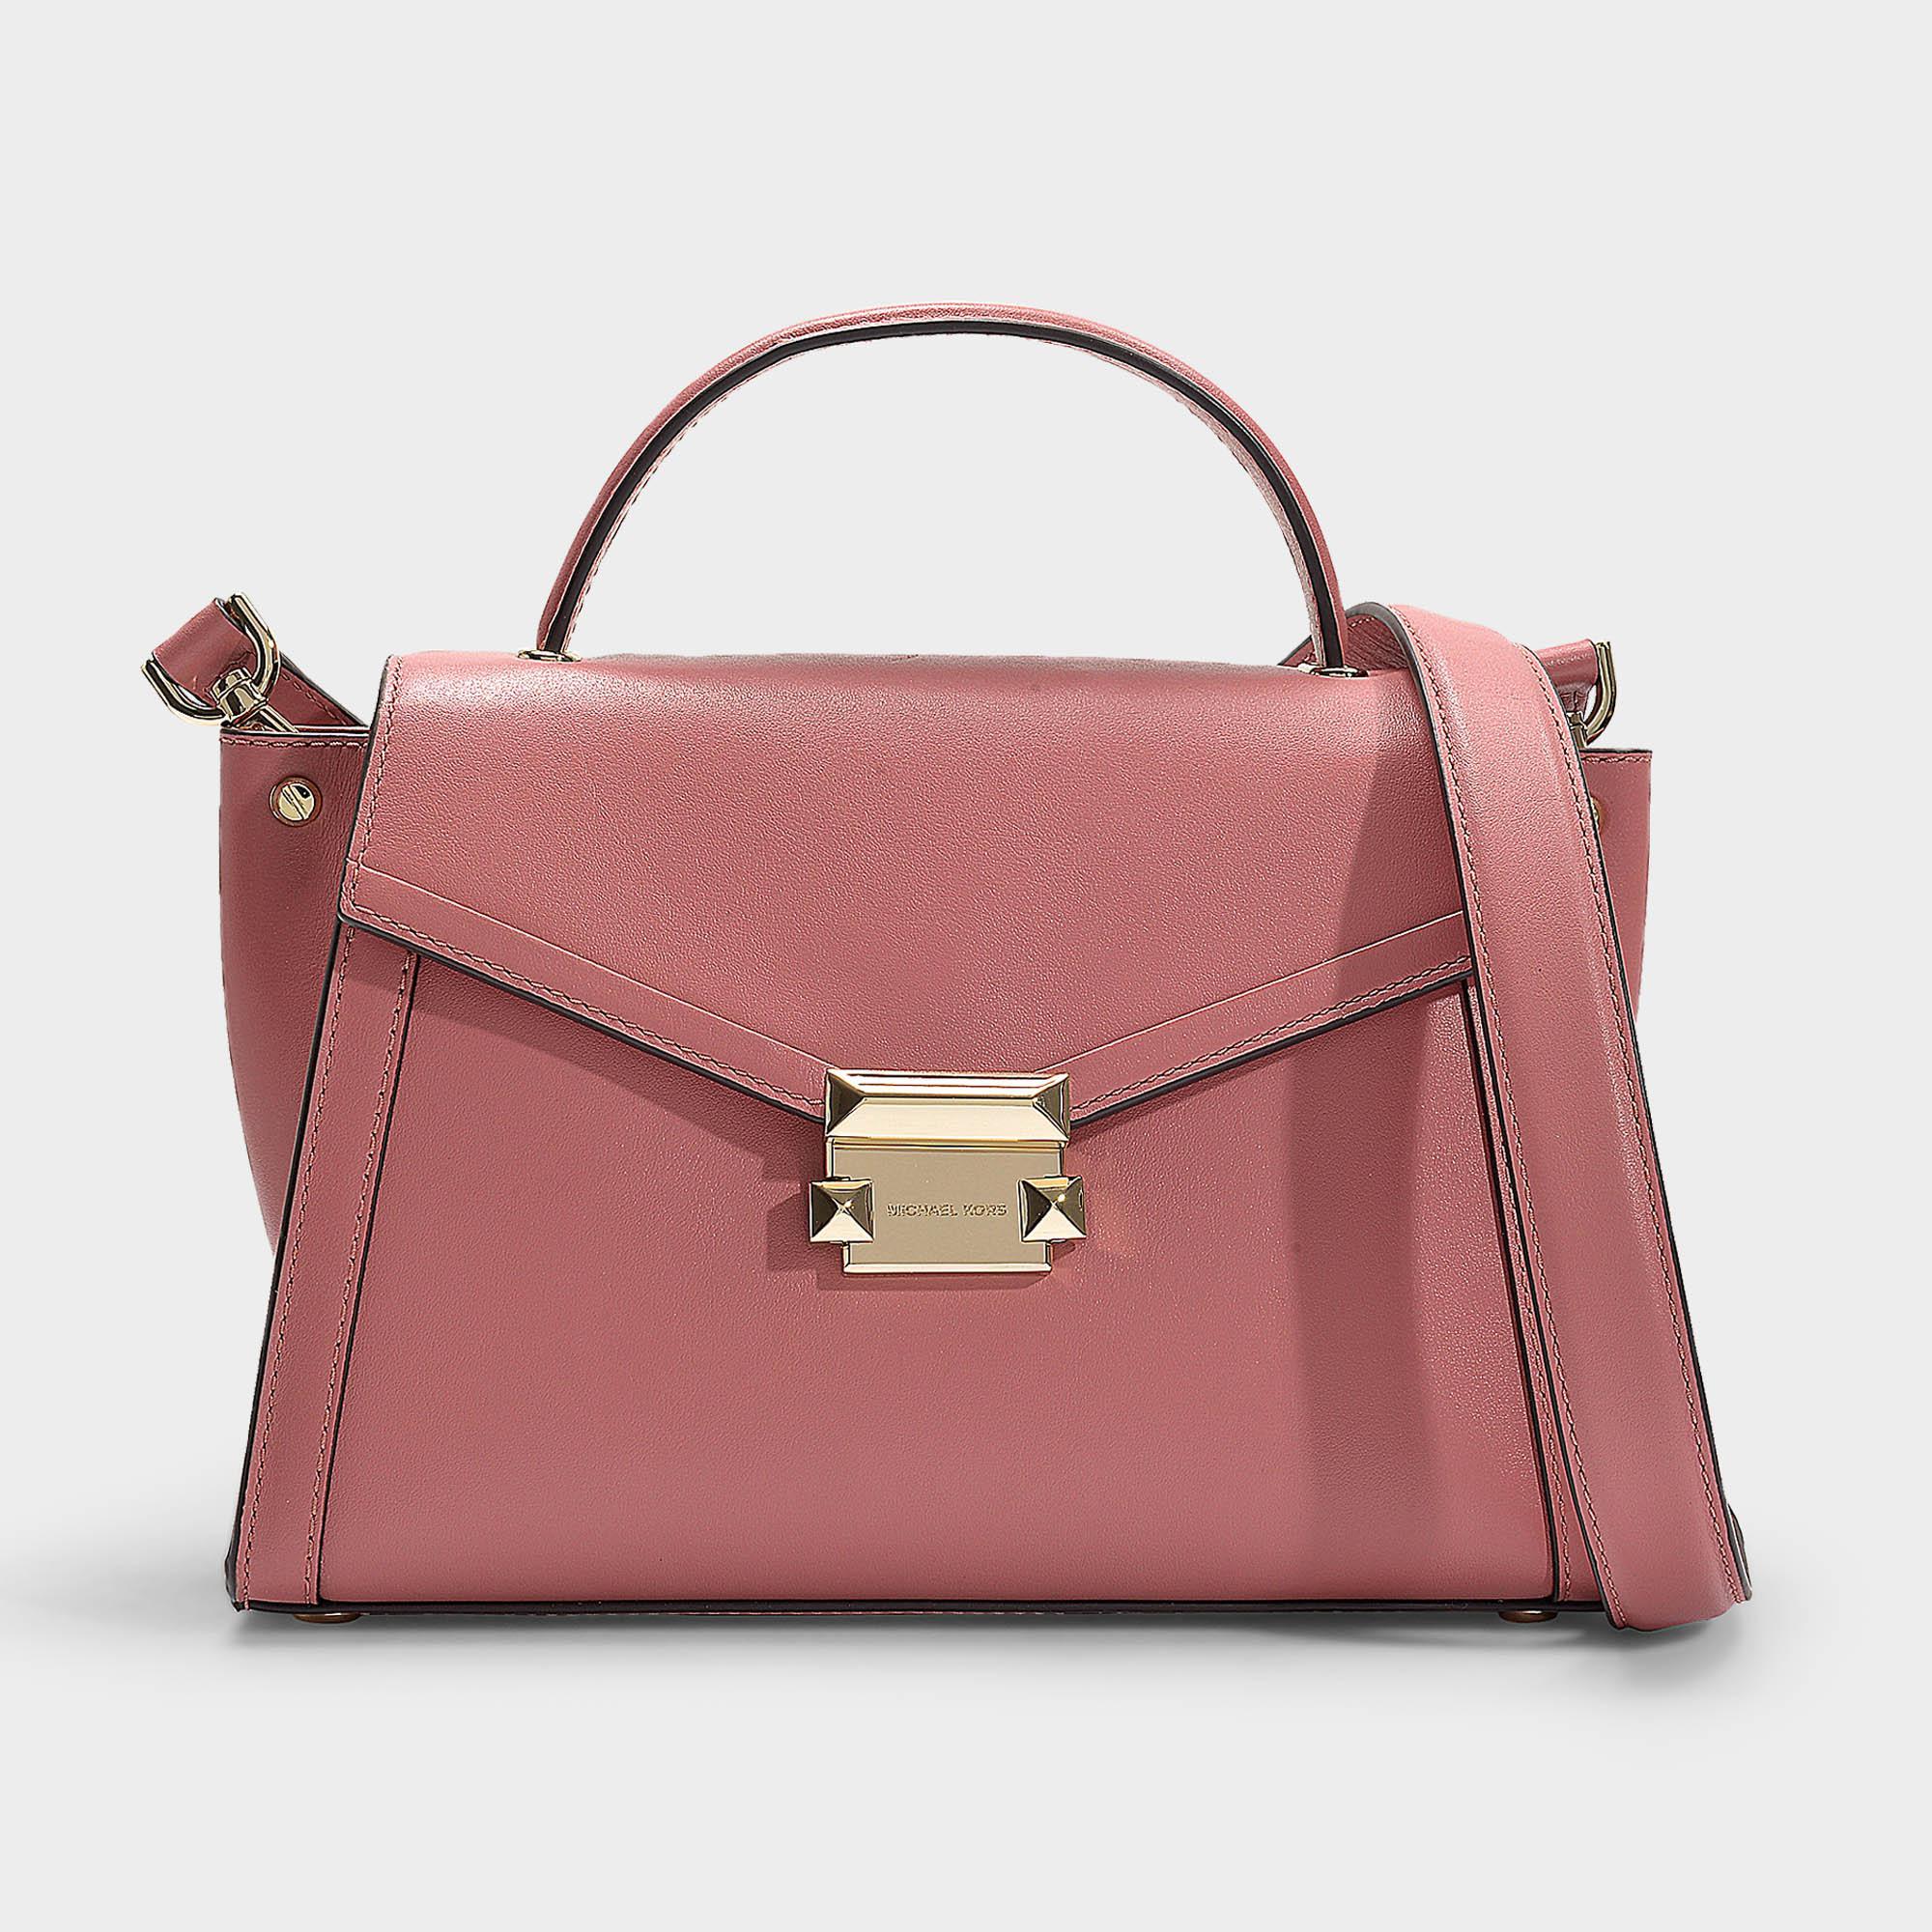 Whitney Medium Top Handle Satchel Bag In Rose Calfskin